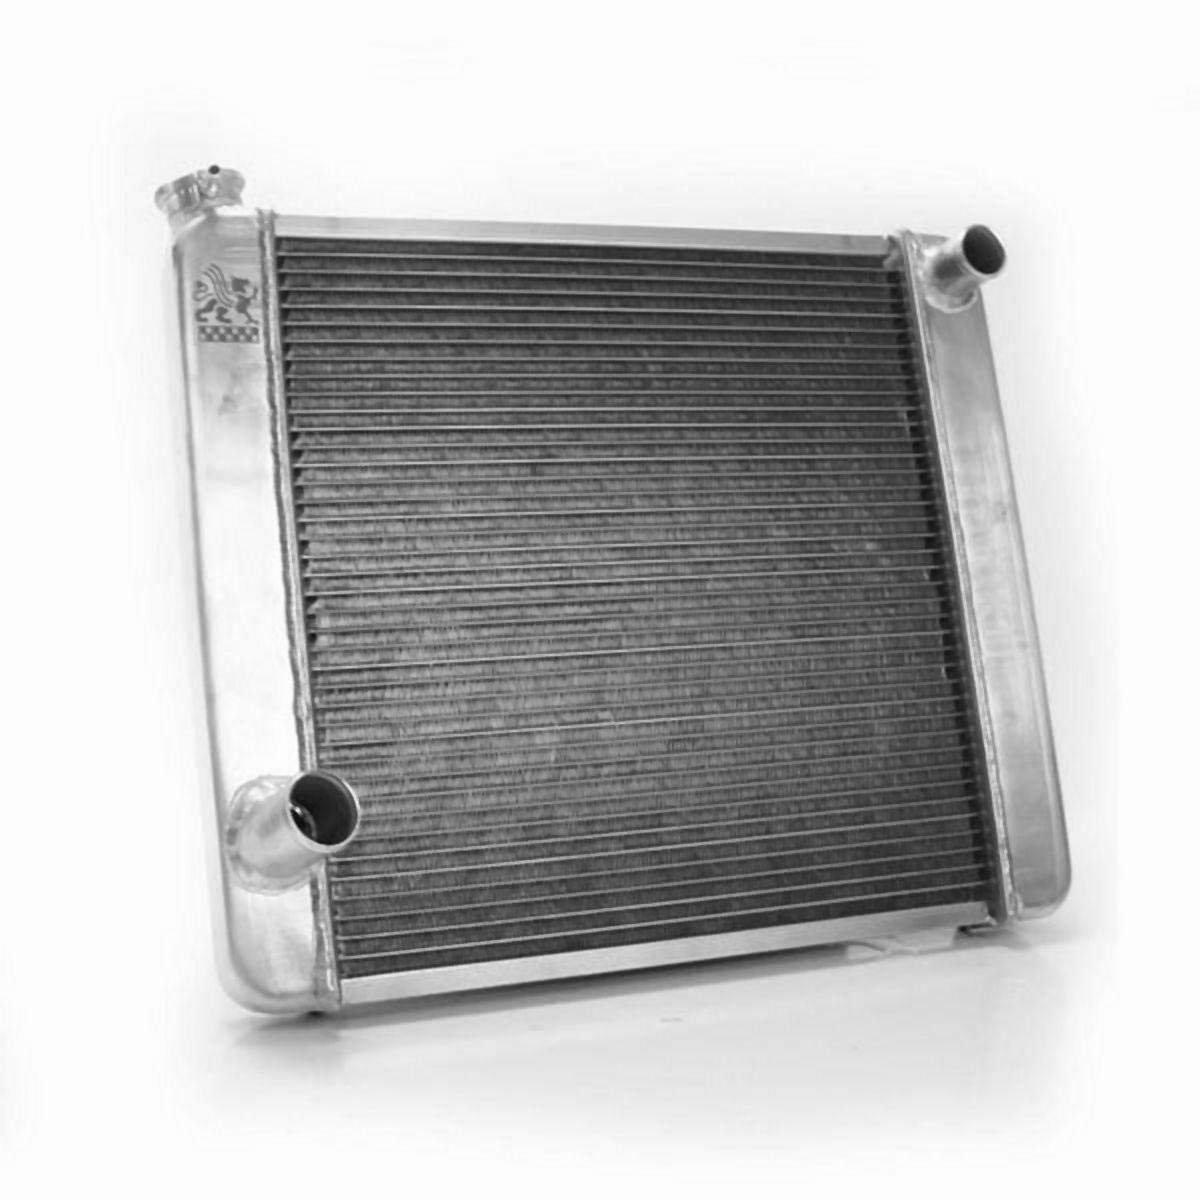 Griffin 1-56182-XS Radiator Griffin Radiator